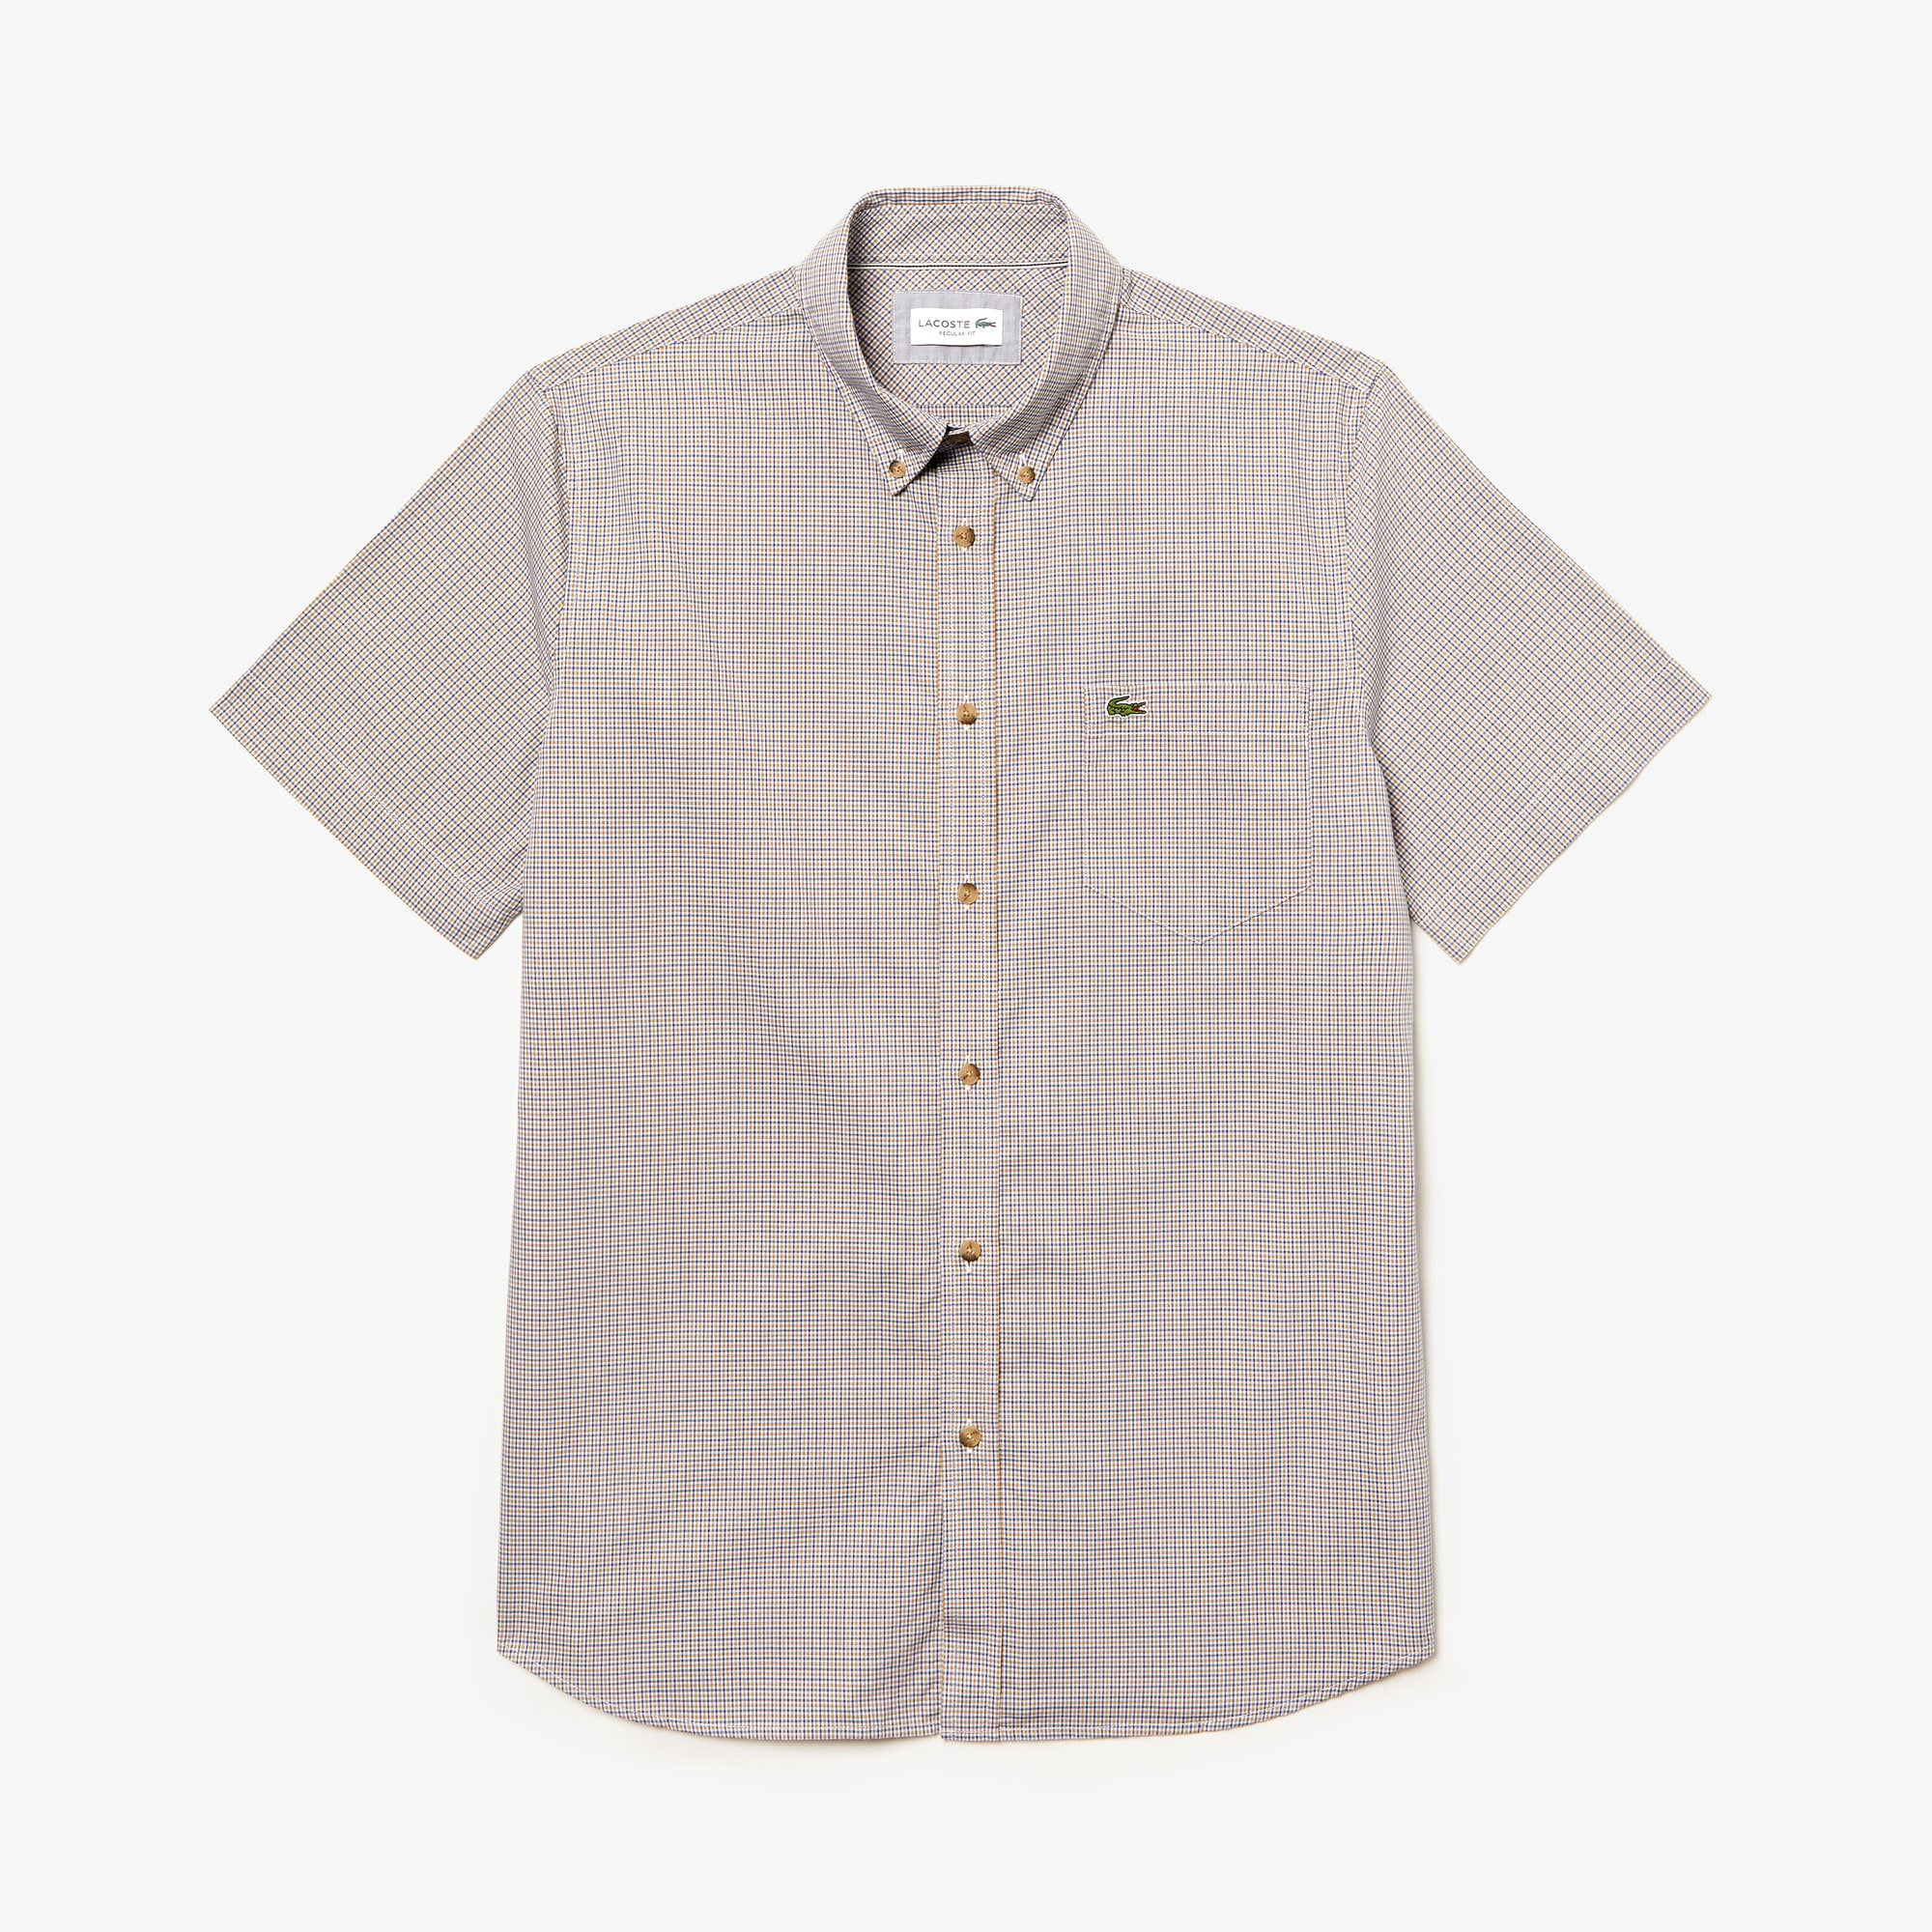 272c7223ba Button Down Shirts | Men's Fashion | LACOSTE